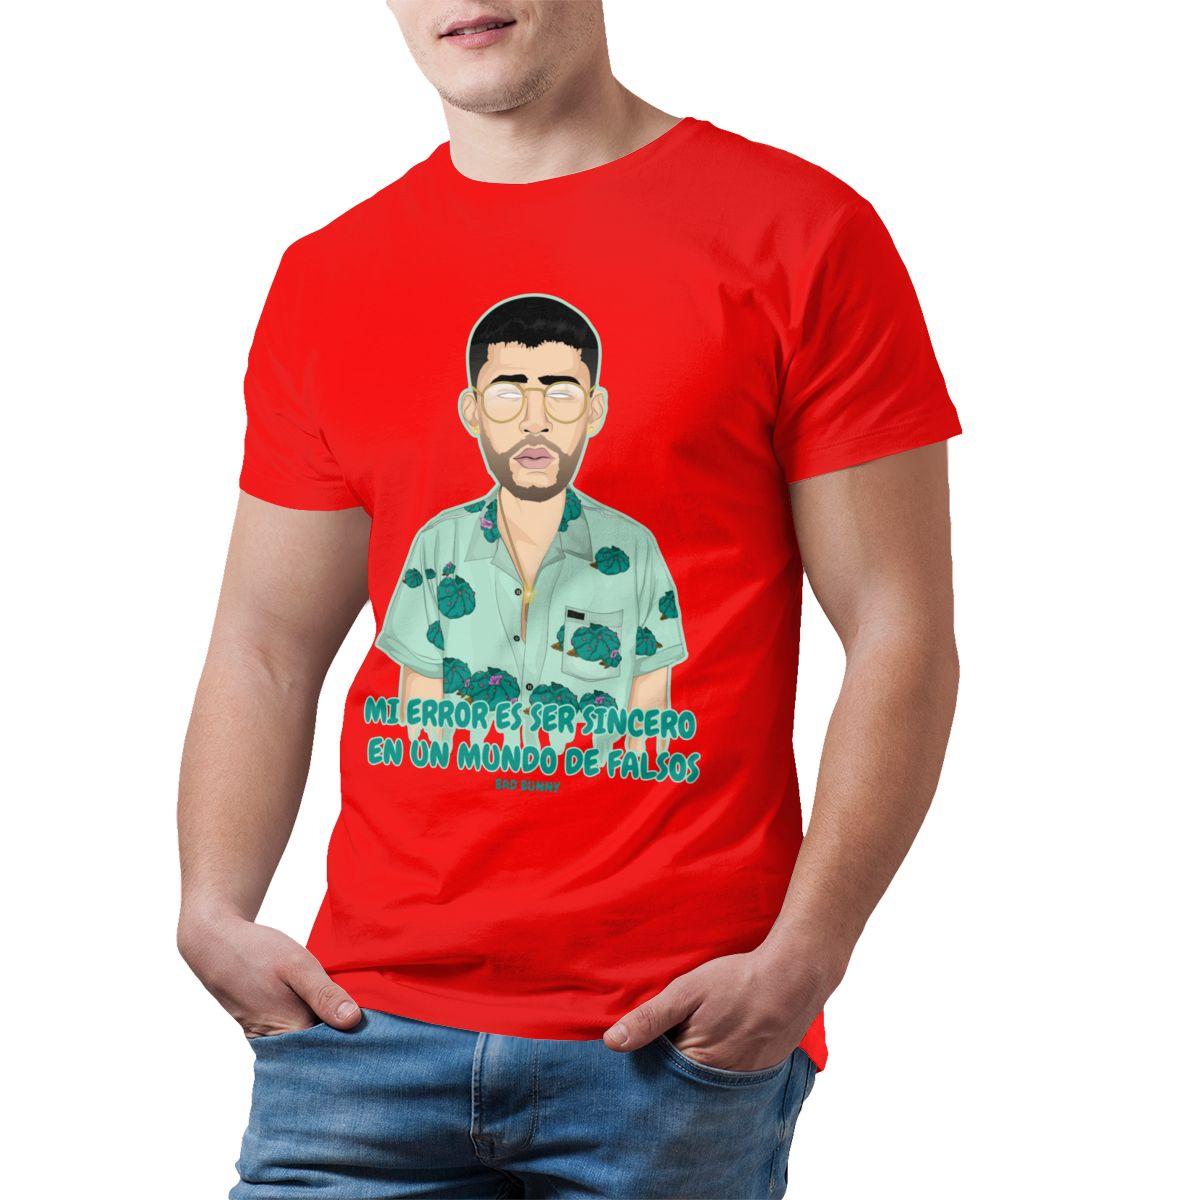 bad bunny short sleeve oversized t shirt bbm0108 3250 - Bad Bunny Store